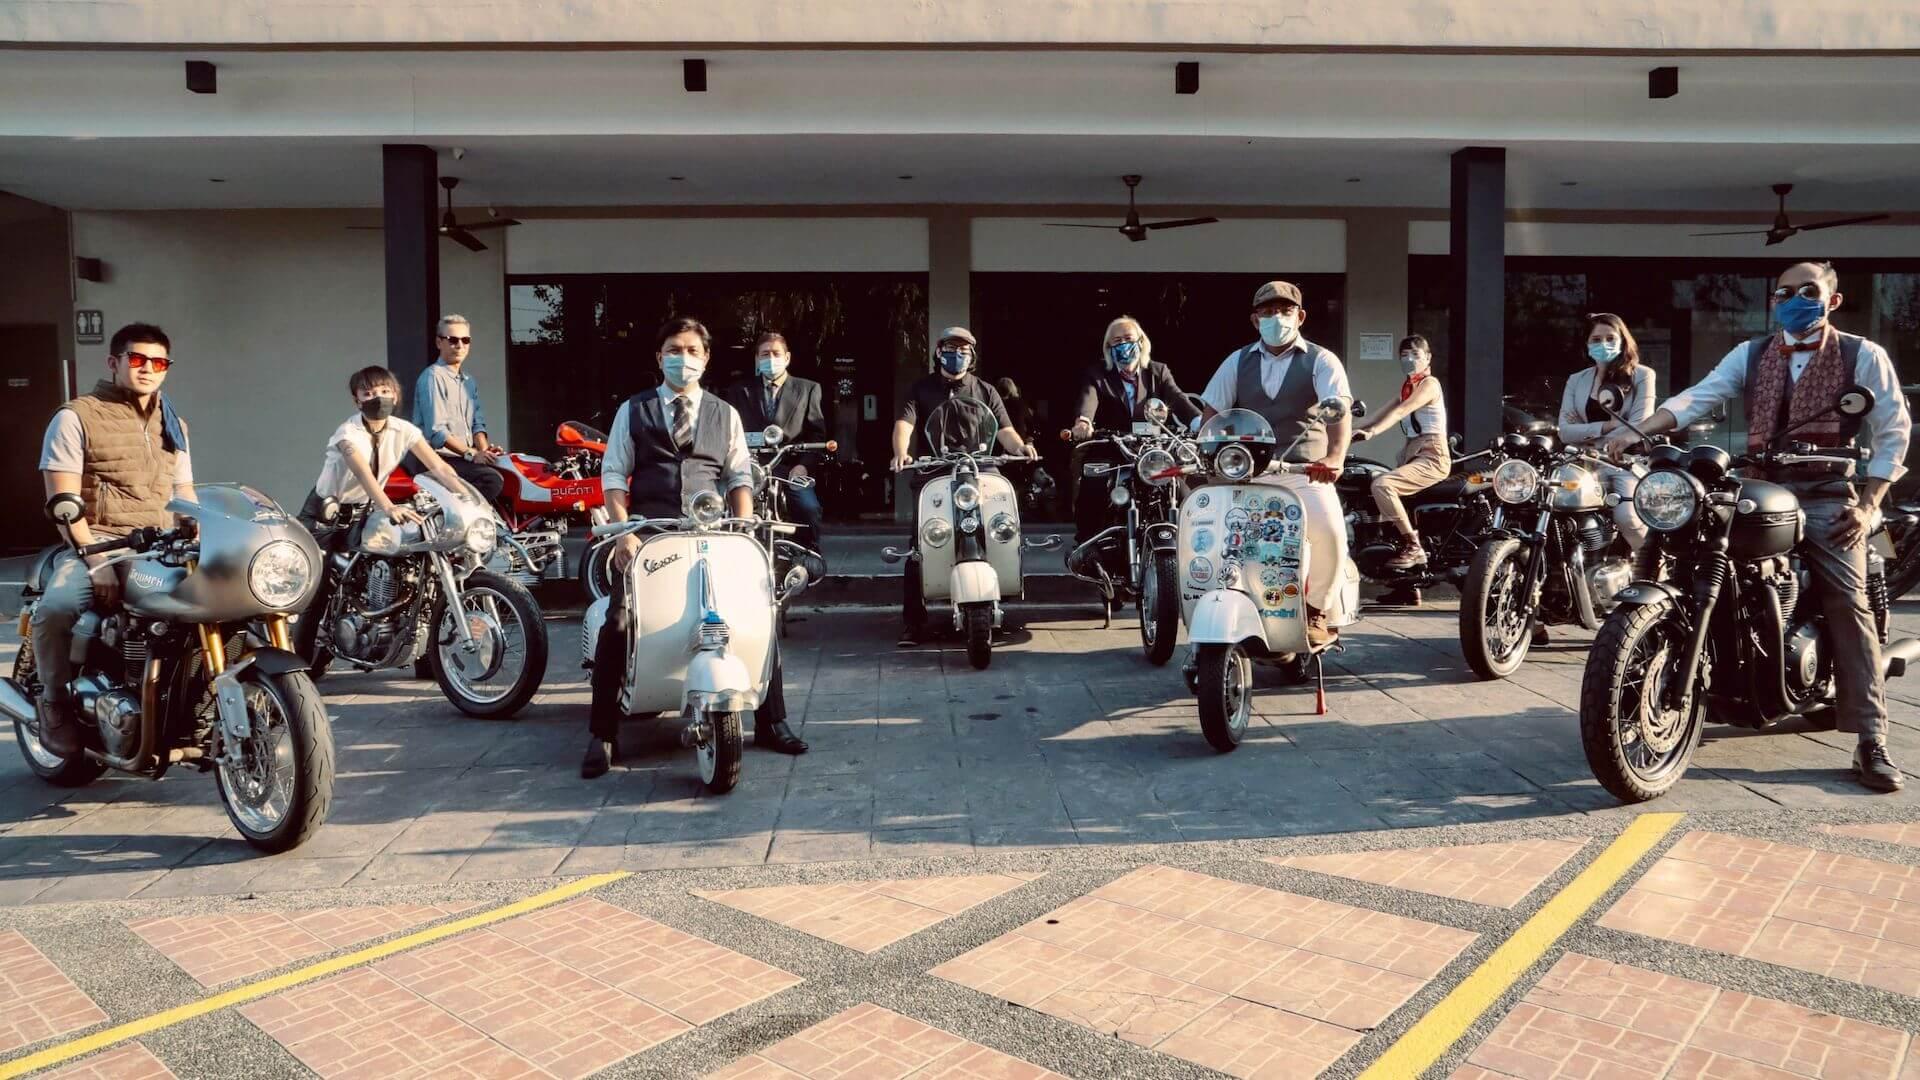 Participants during the DGR 2021 test ride